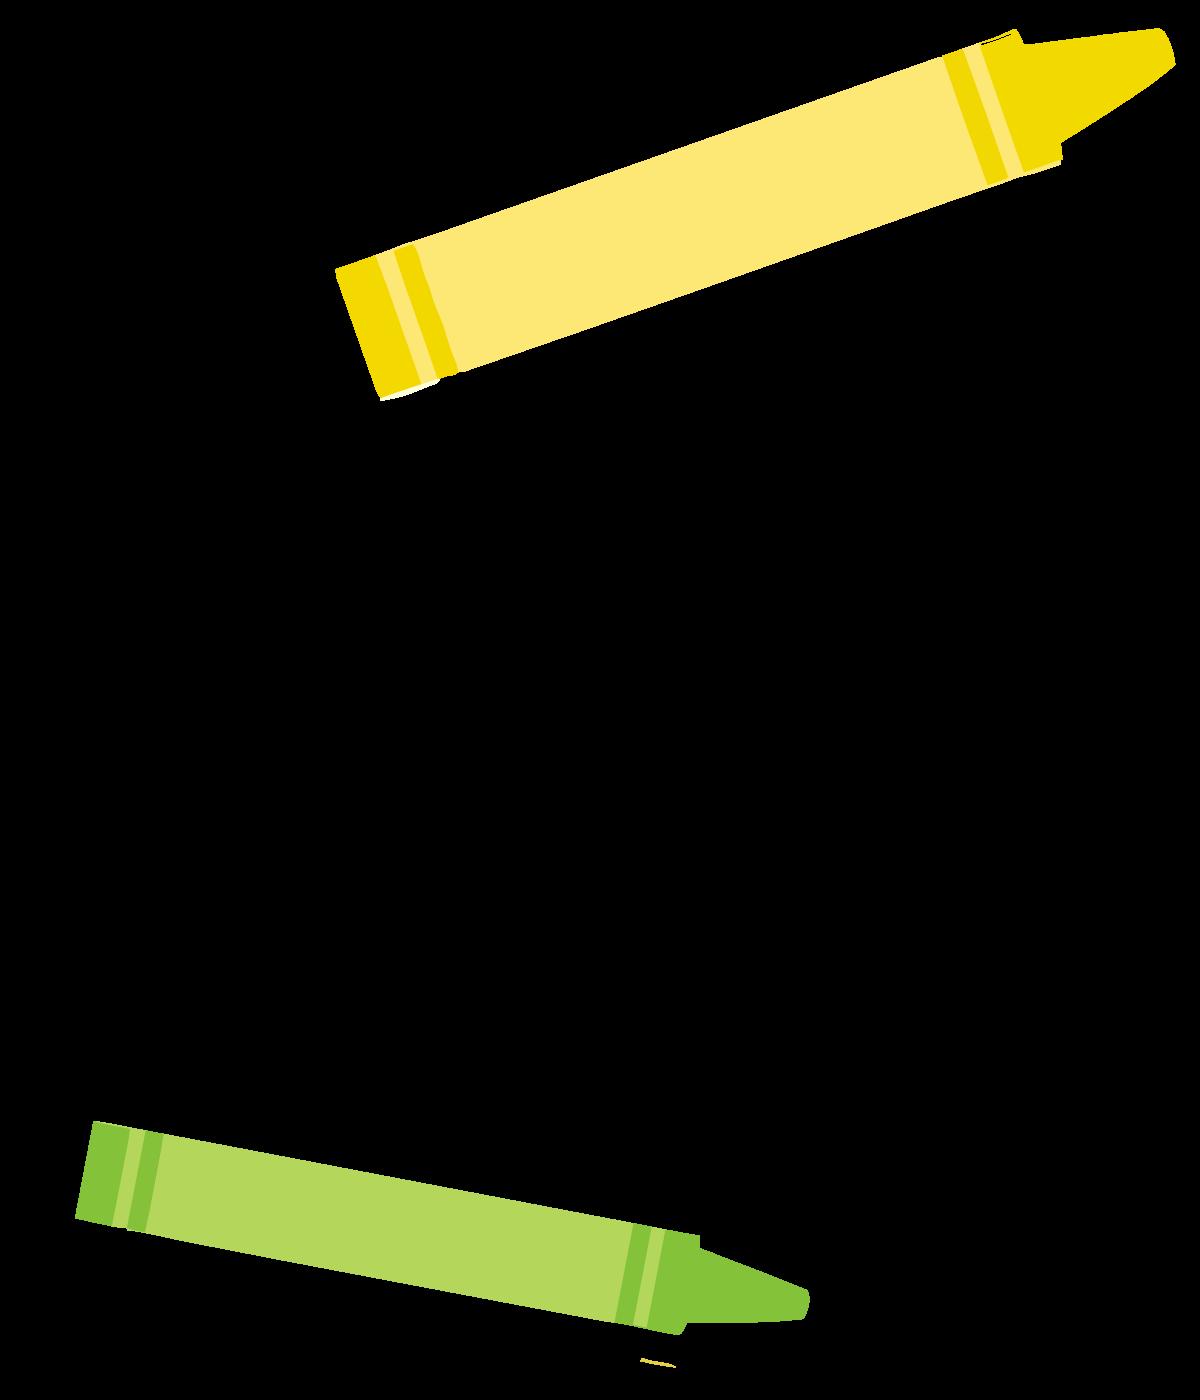 crayons green and yellow